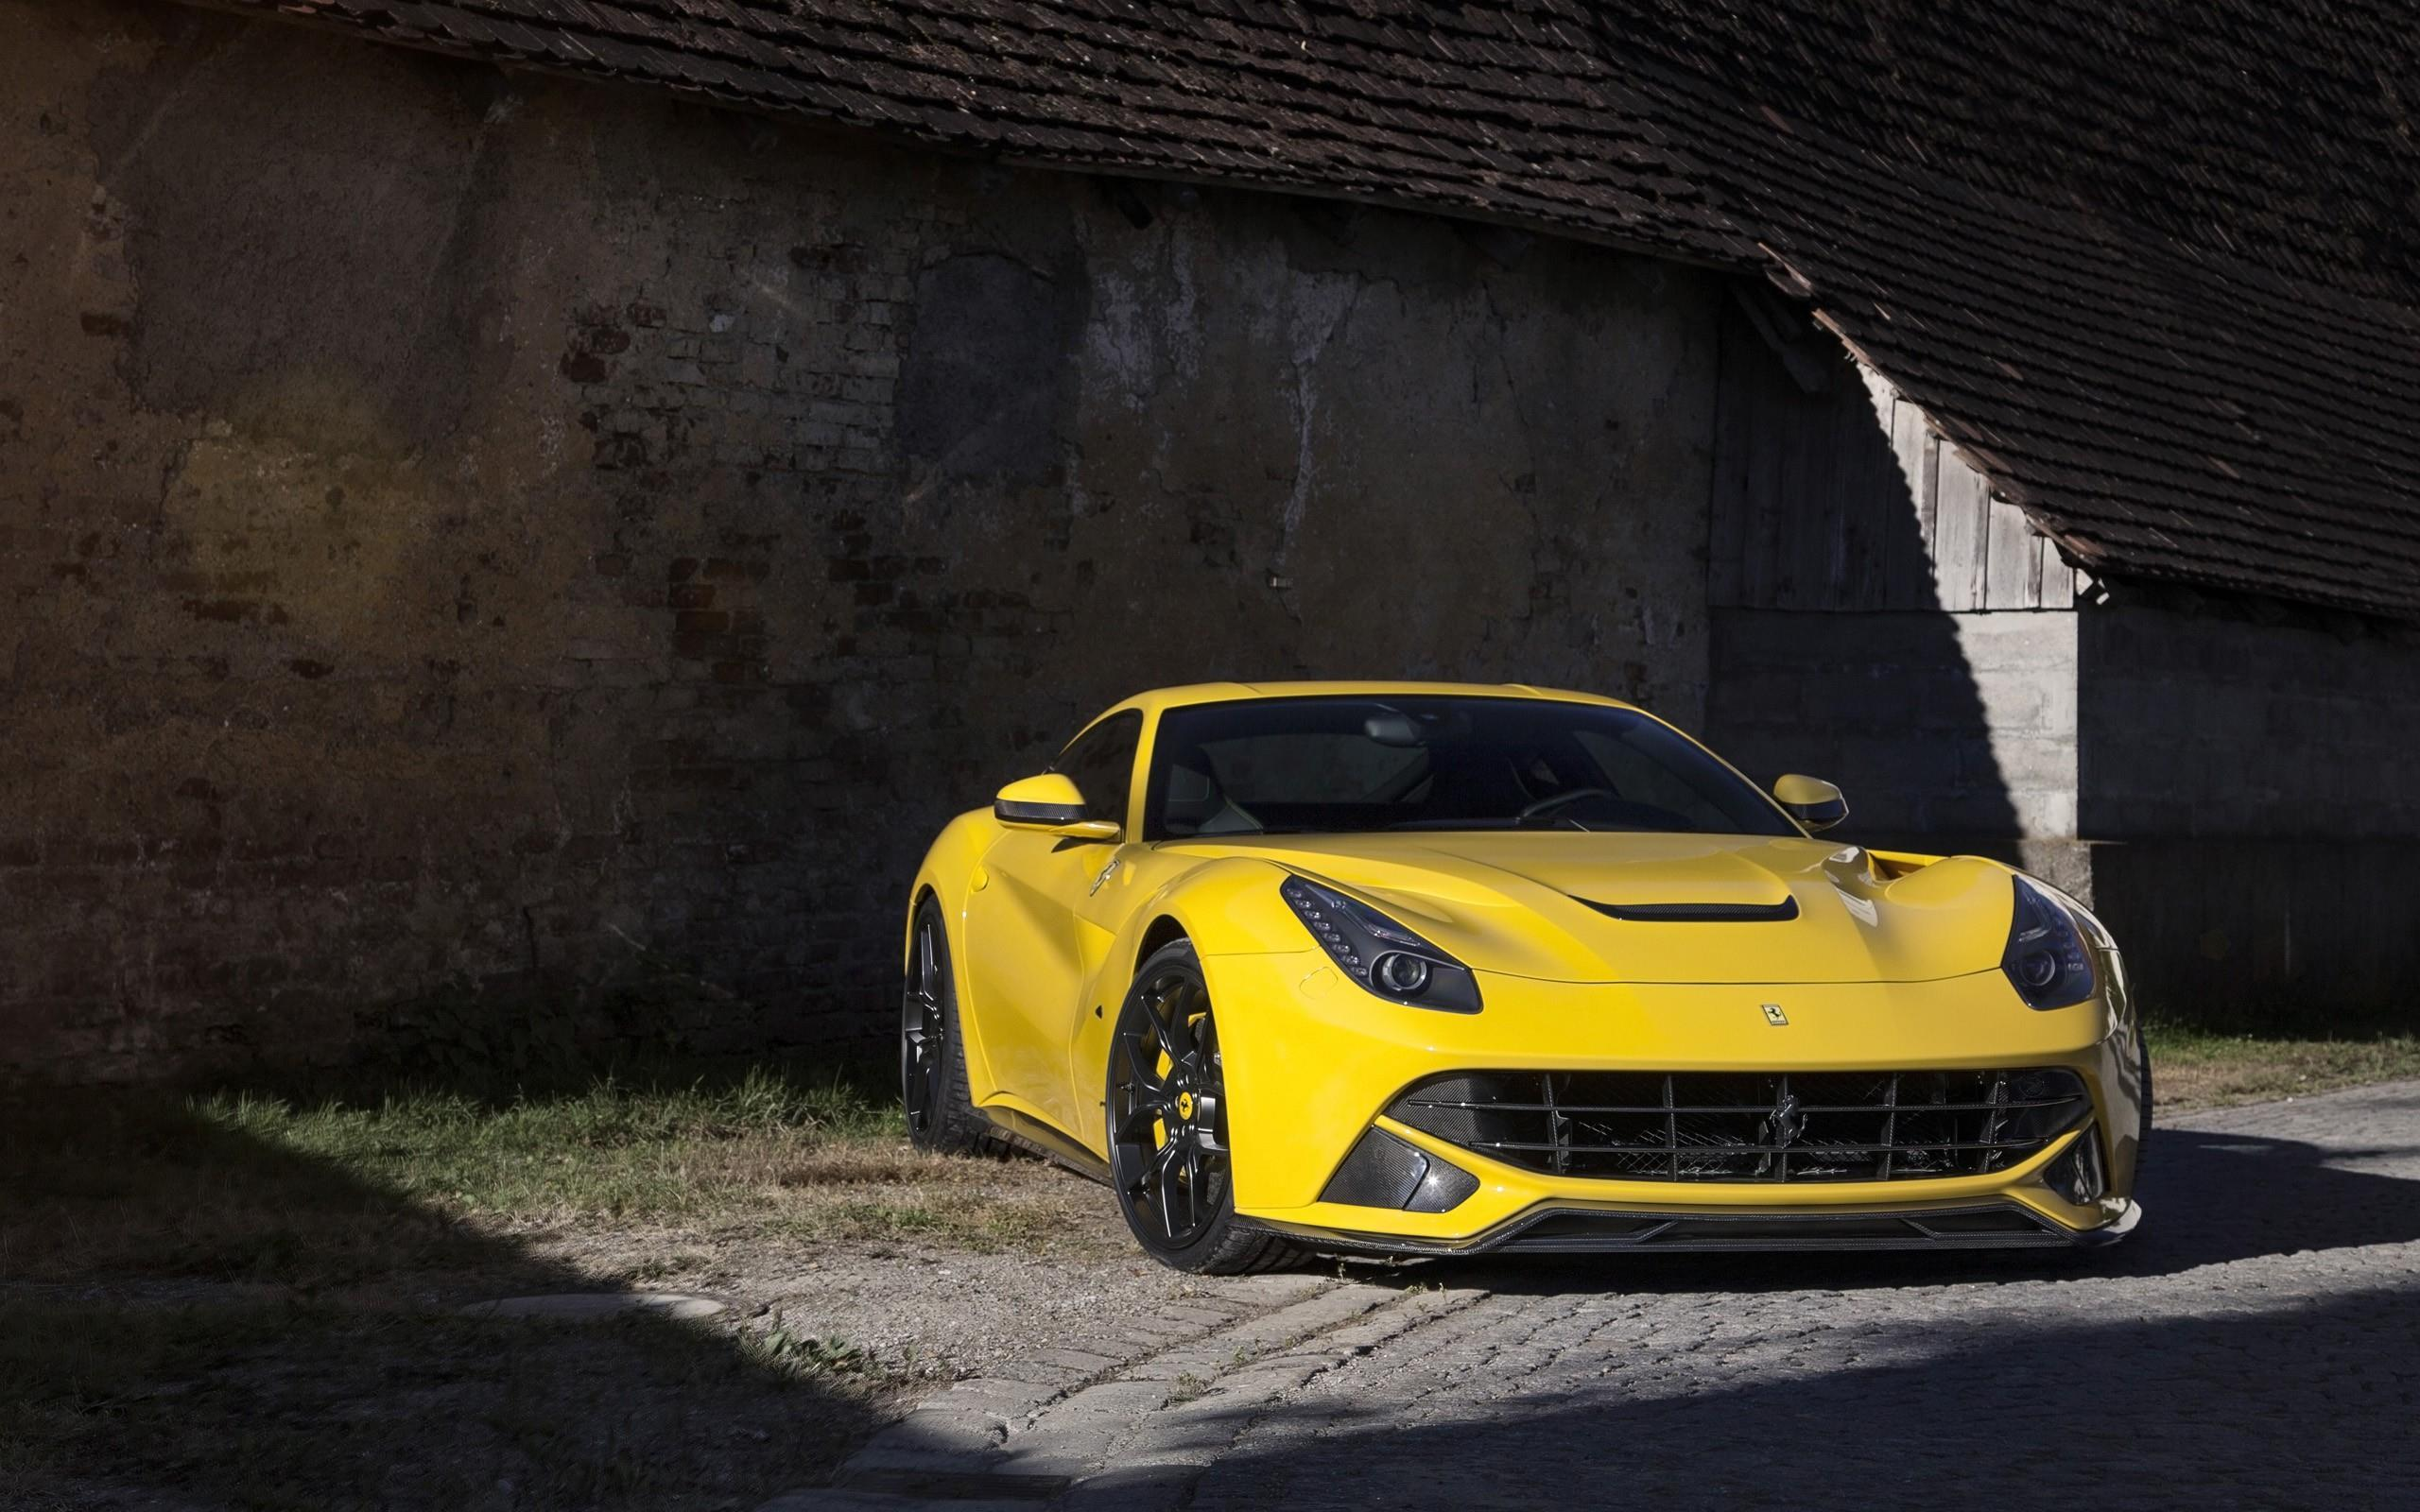 желтый спортивный автомобиль Ferrari F12 Berlinetta Wheelsandmore  № 1564400 бесплатно